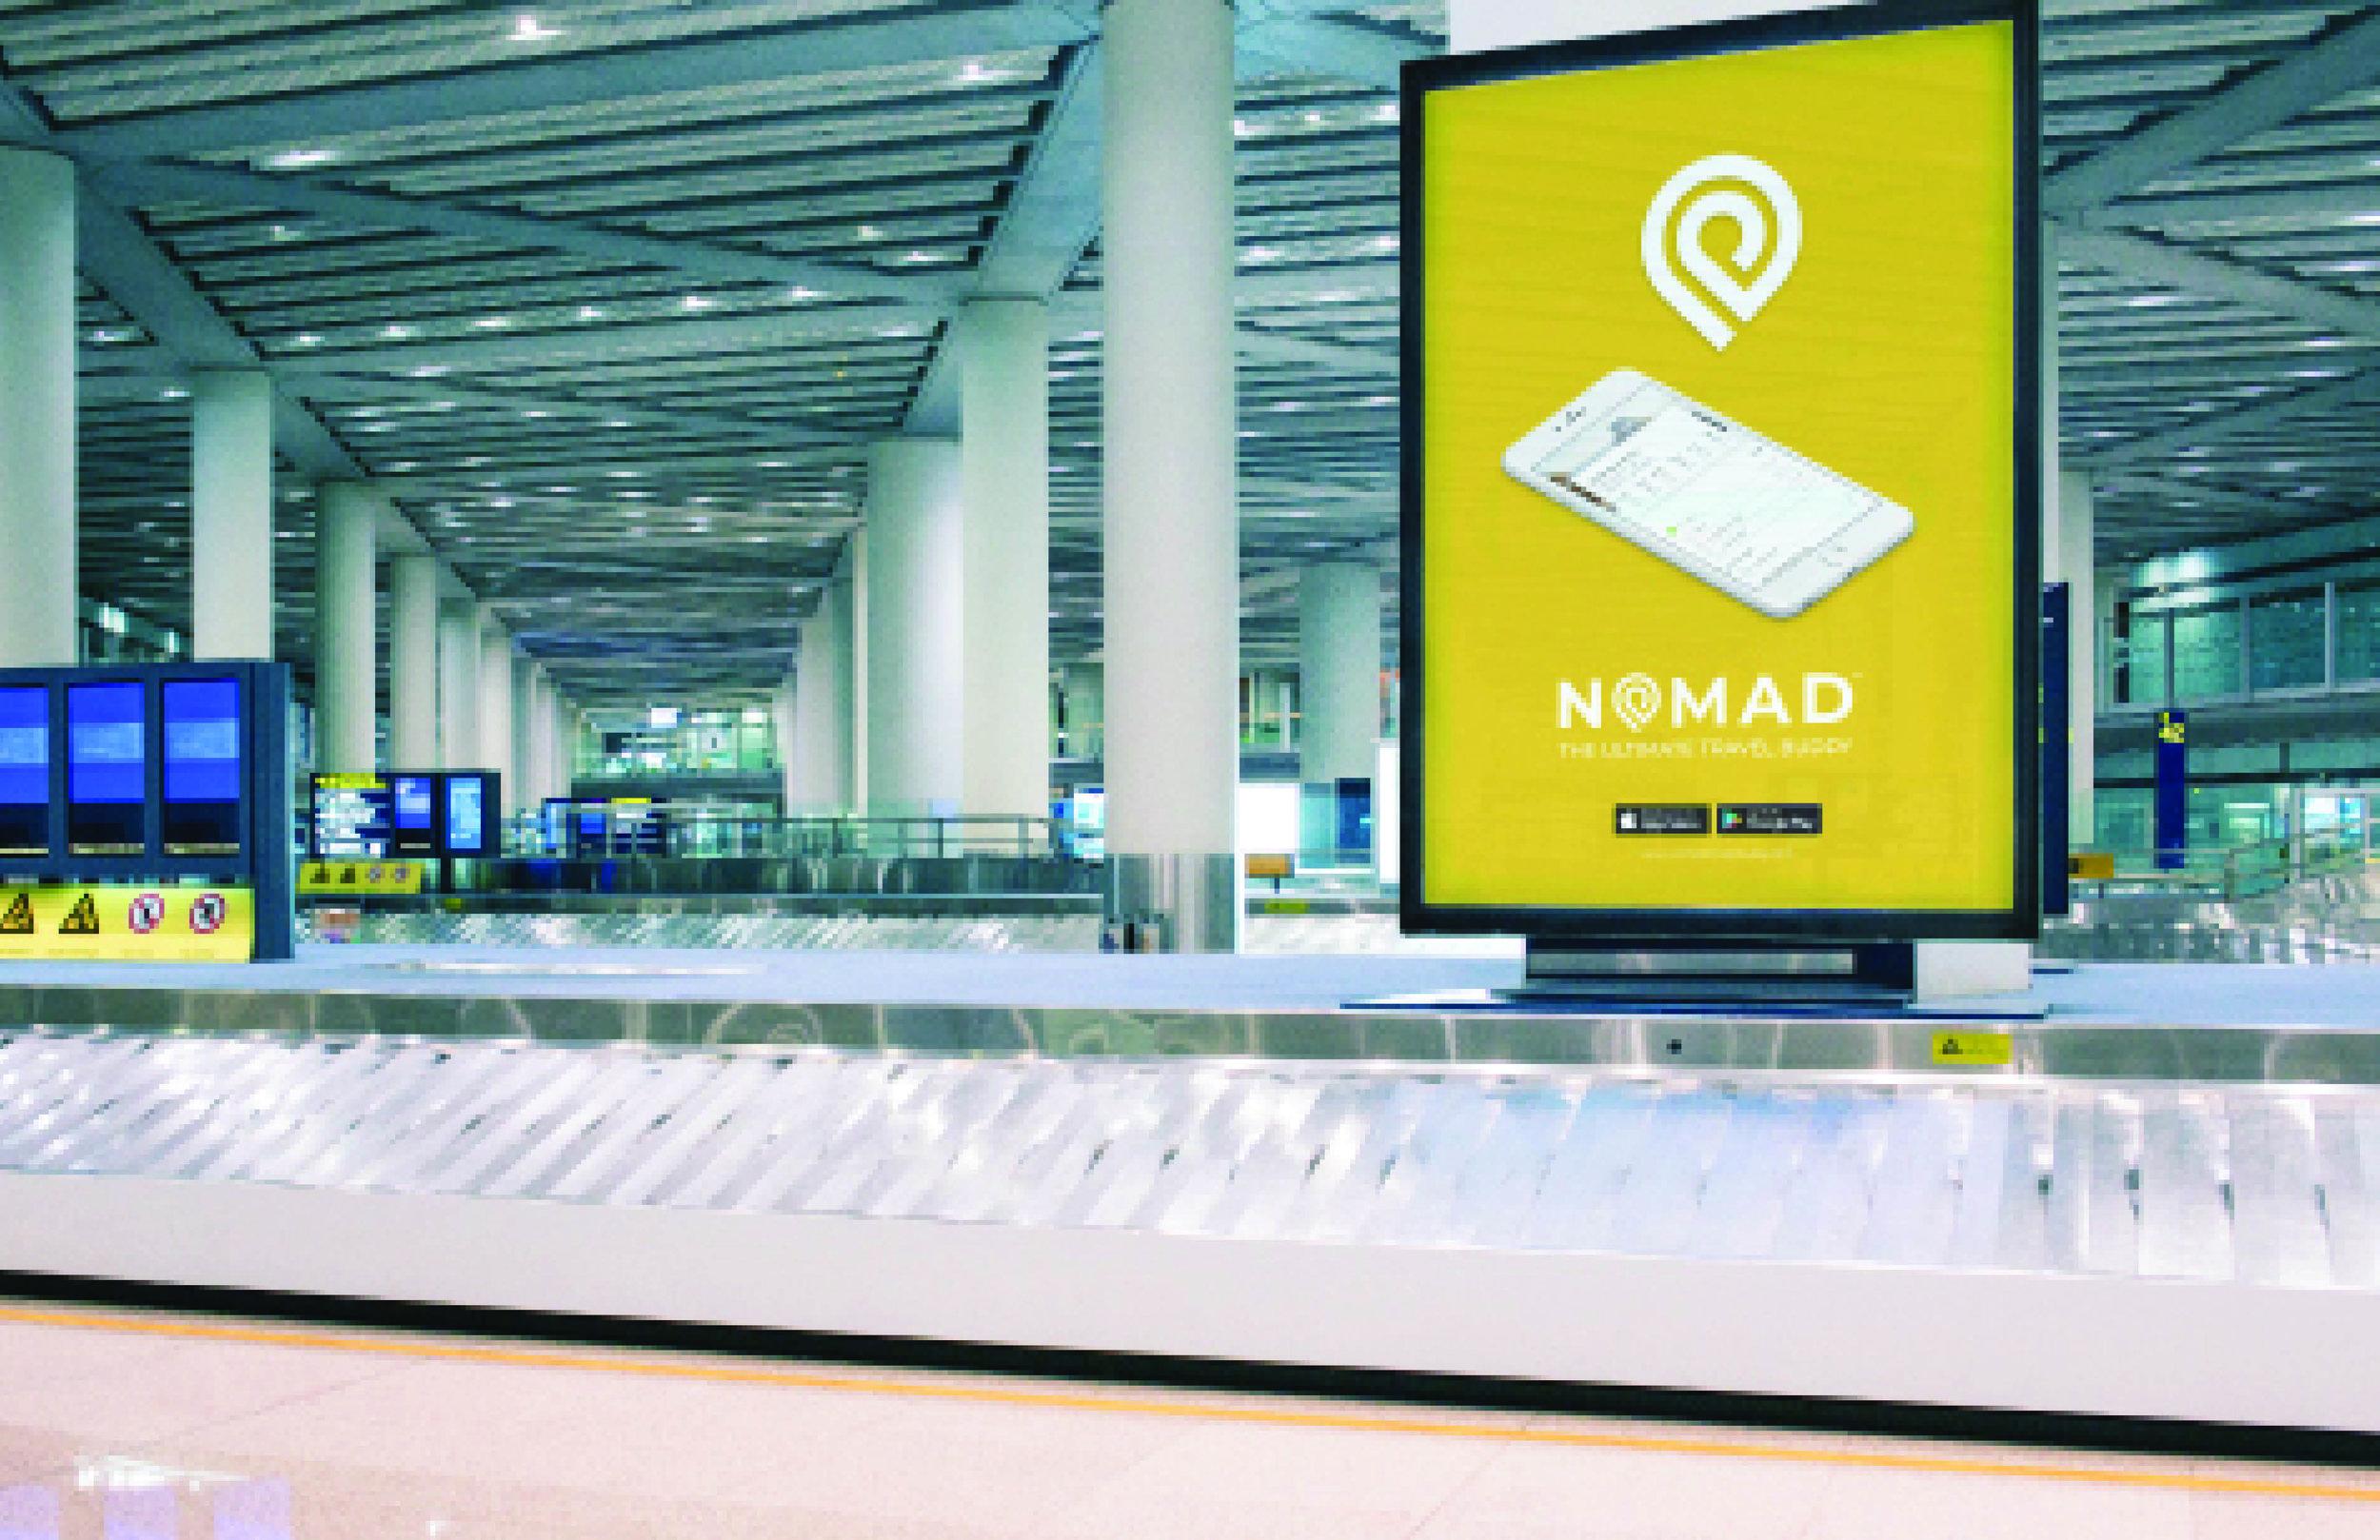 Nomad_Process9.jpg